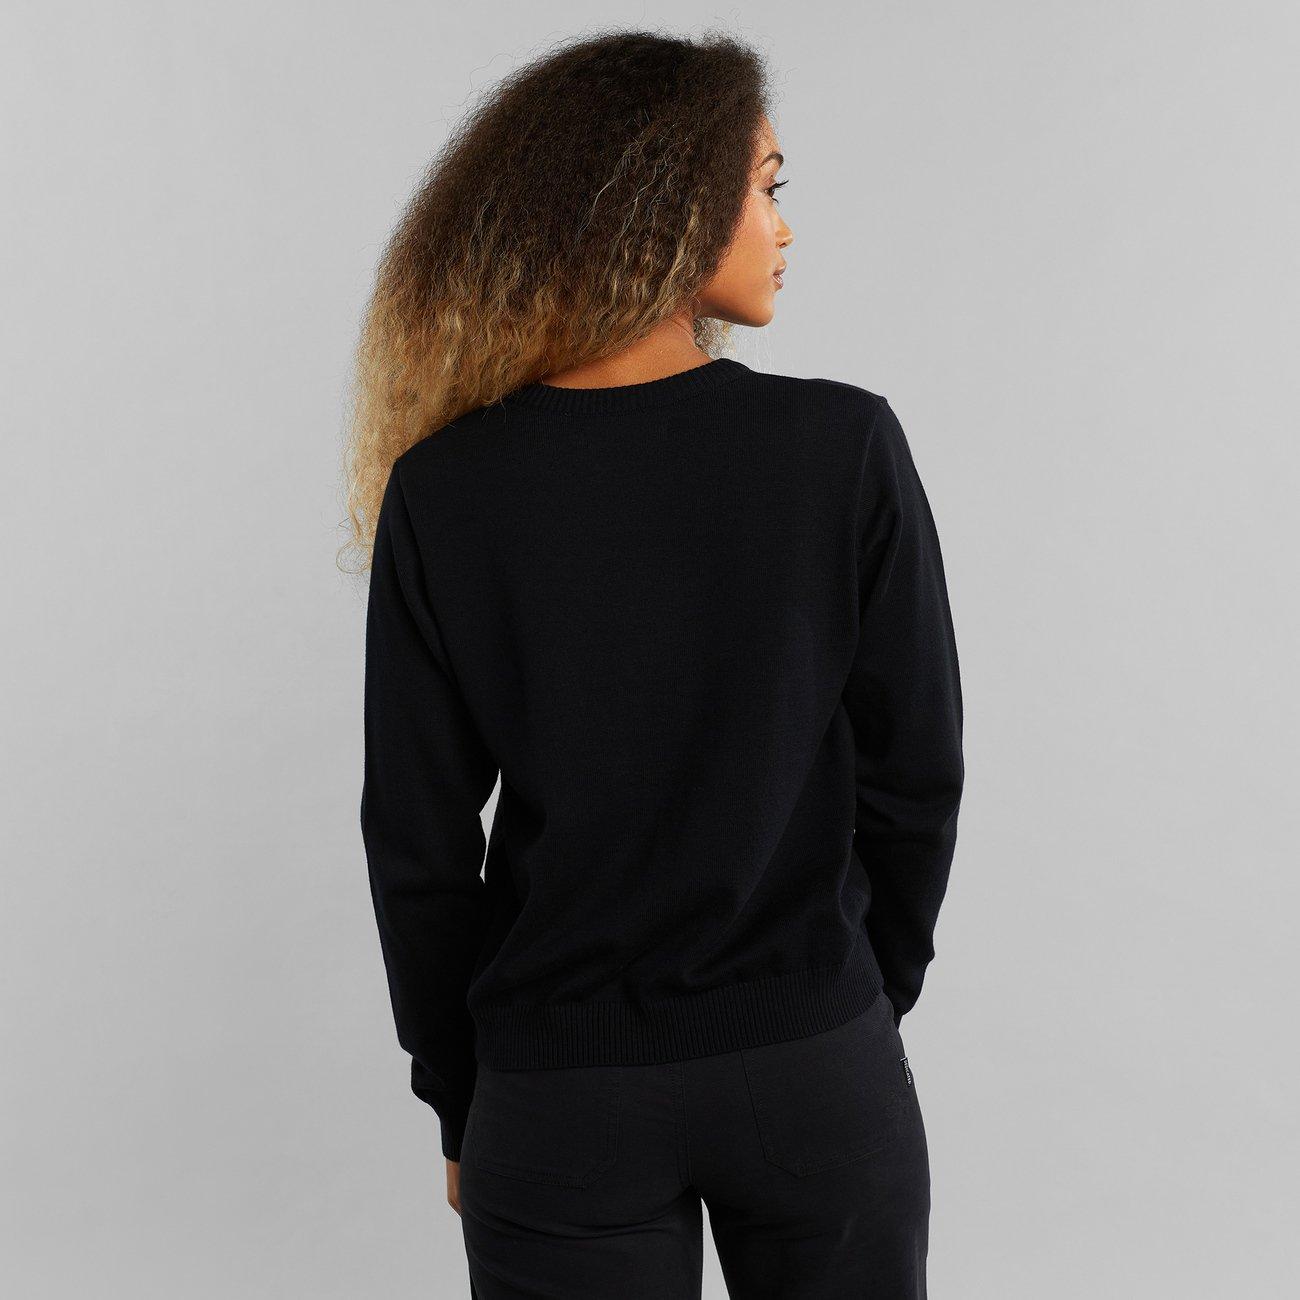 Sweater Arendal Black